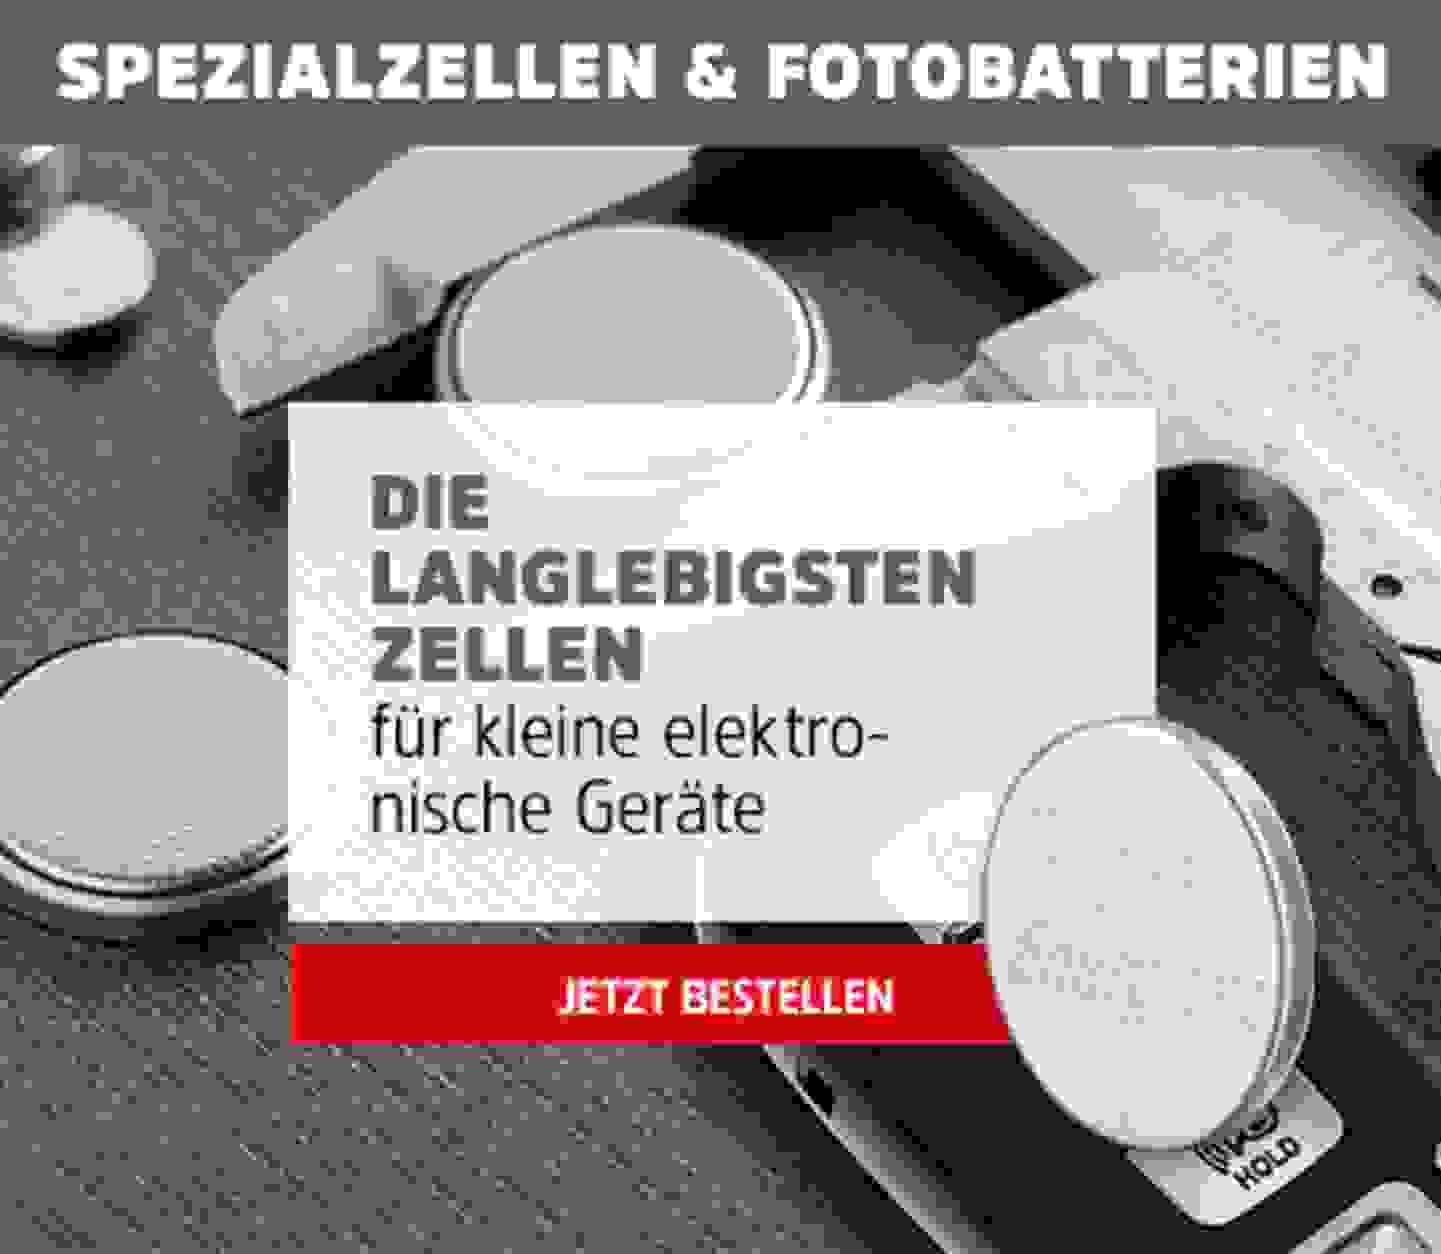 Spezialzellen & Fotobatterien